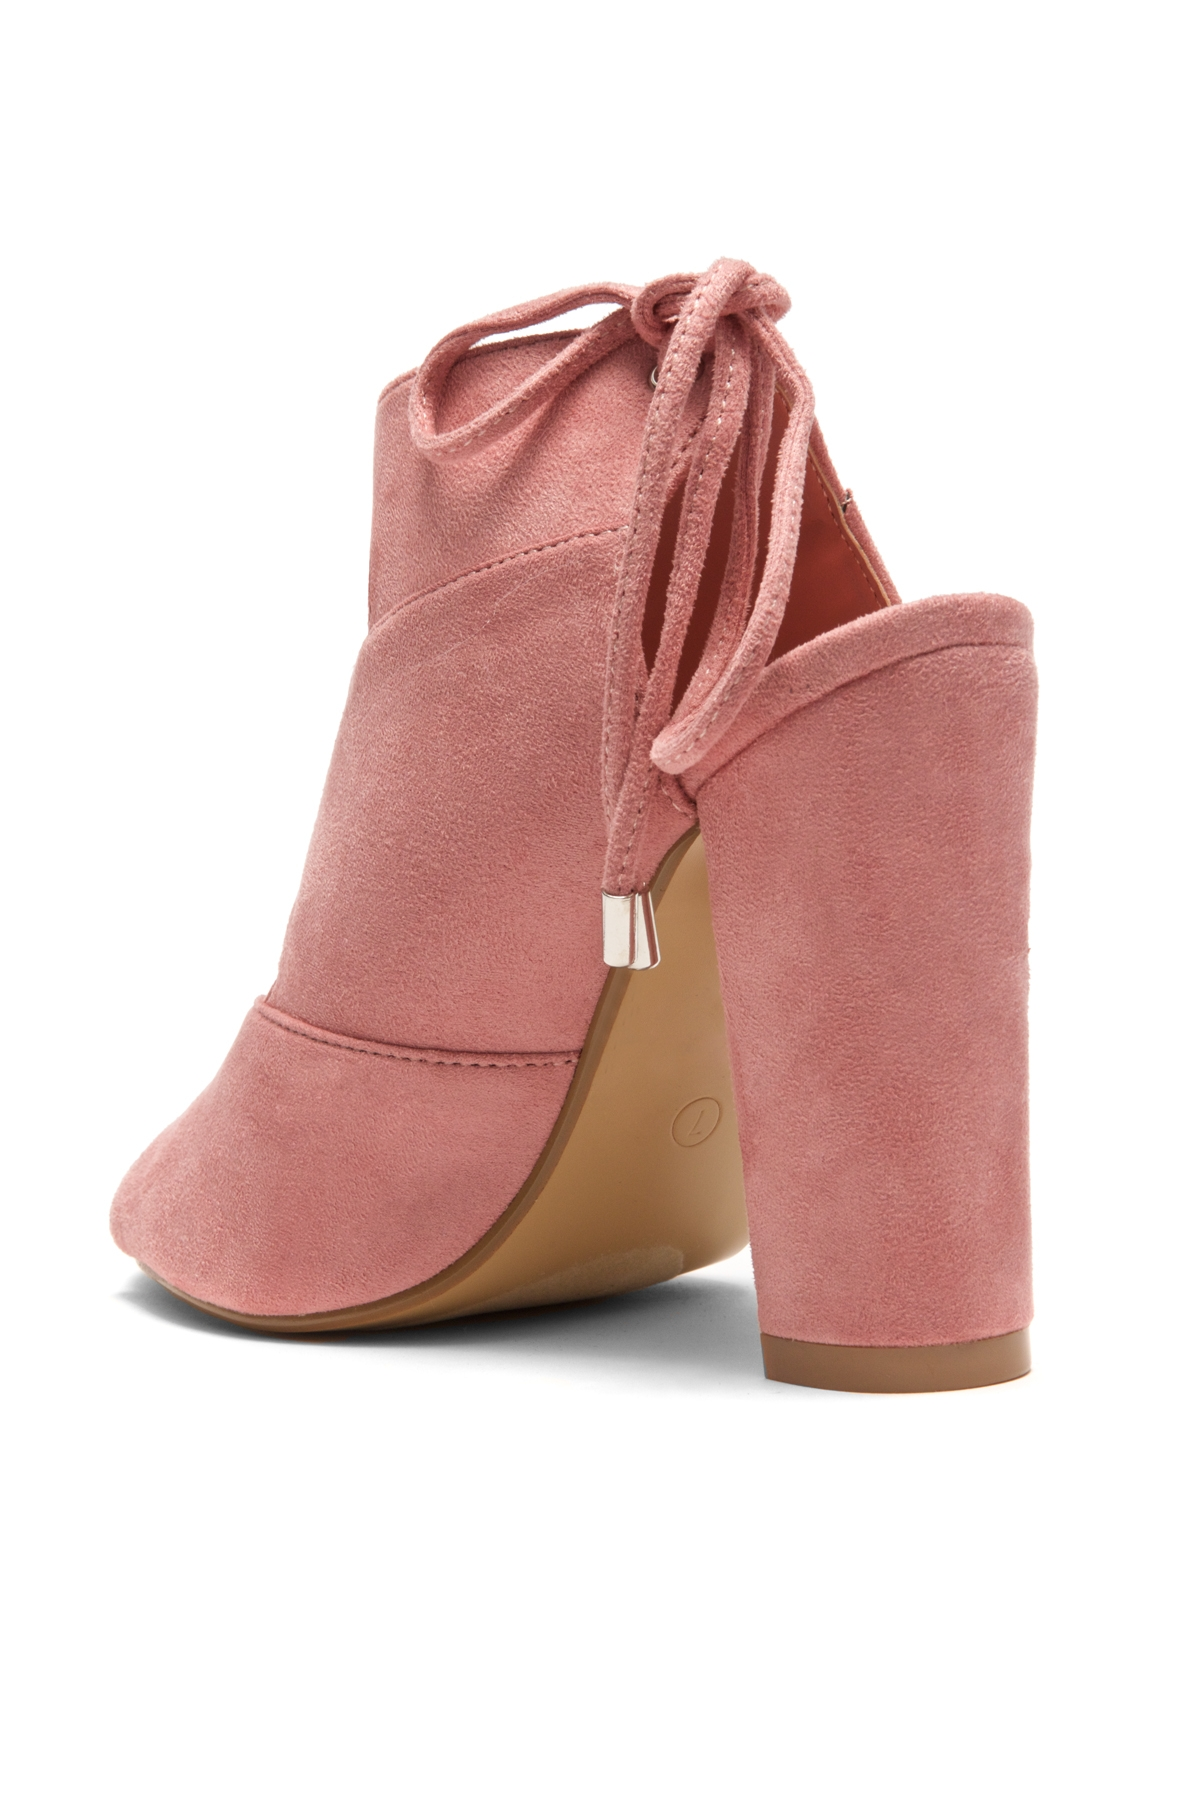 74e05dcd2e7d2 HerStyle Mocha Laser Cut, Chunky Heeled Sandals (Mauve)